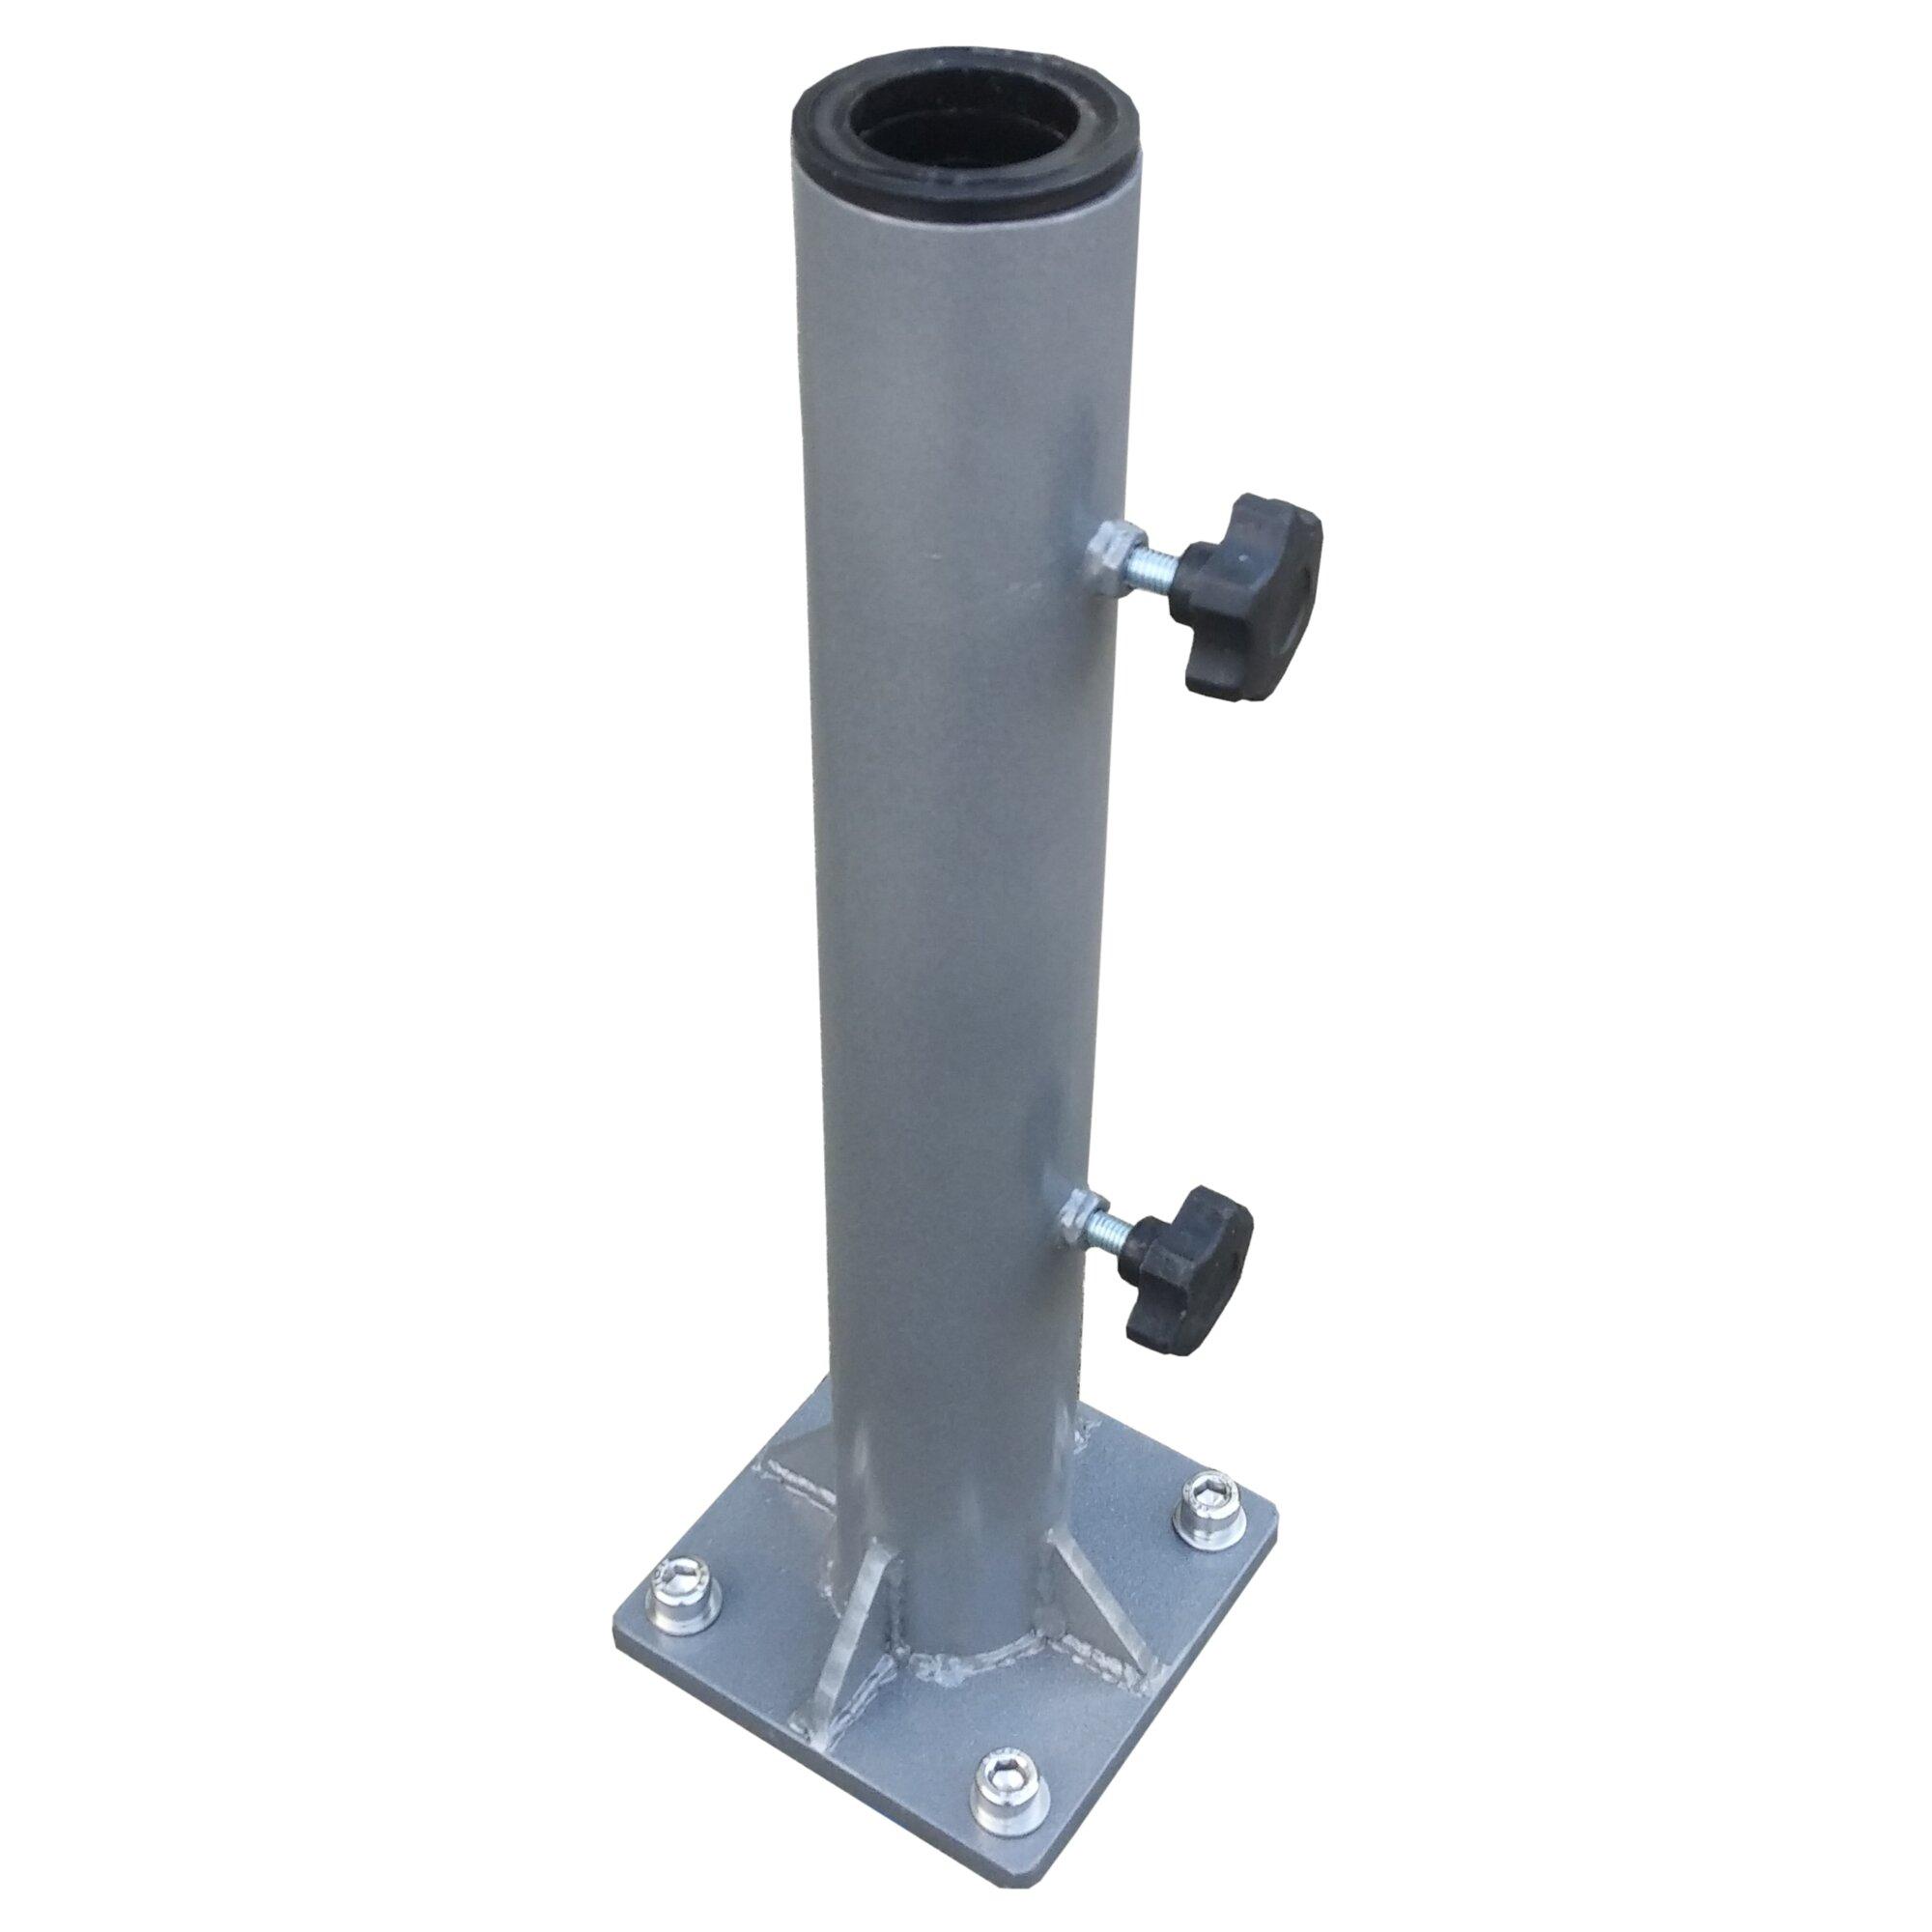 Greencorner Steel Deck Mount Umbrella Base & Reviews | Wayfair